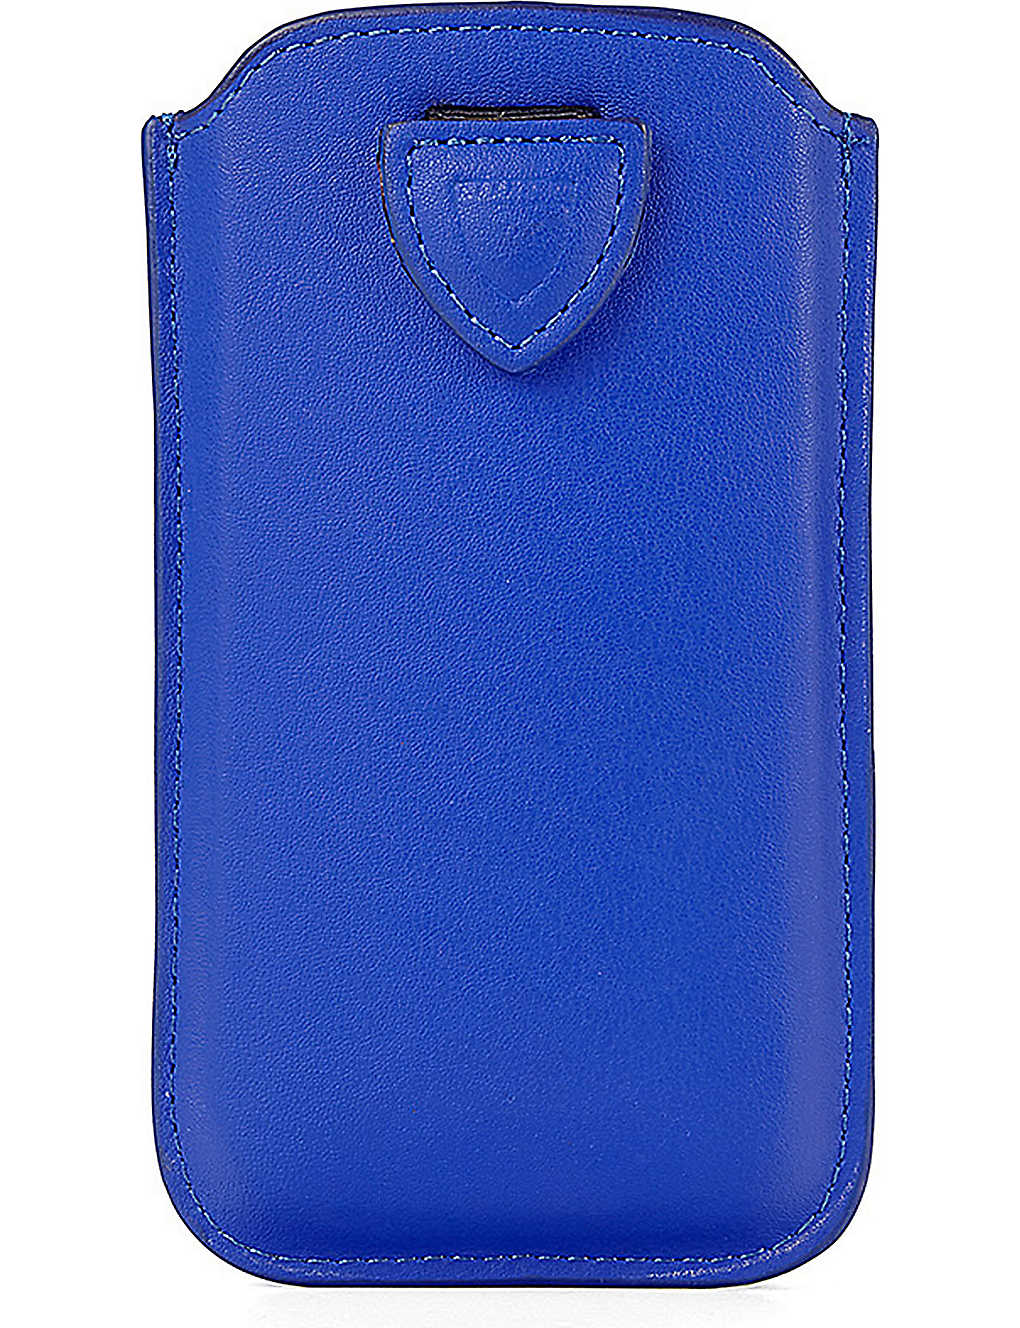 huge selection of 7d633 4b867 ASPINAL OF LONDON - iPhone 6 leather case   Selfridges.com